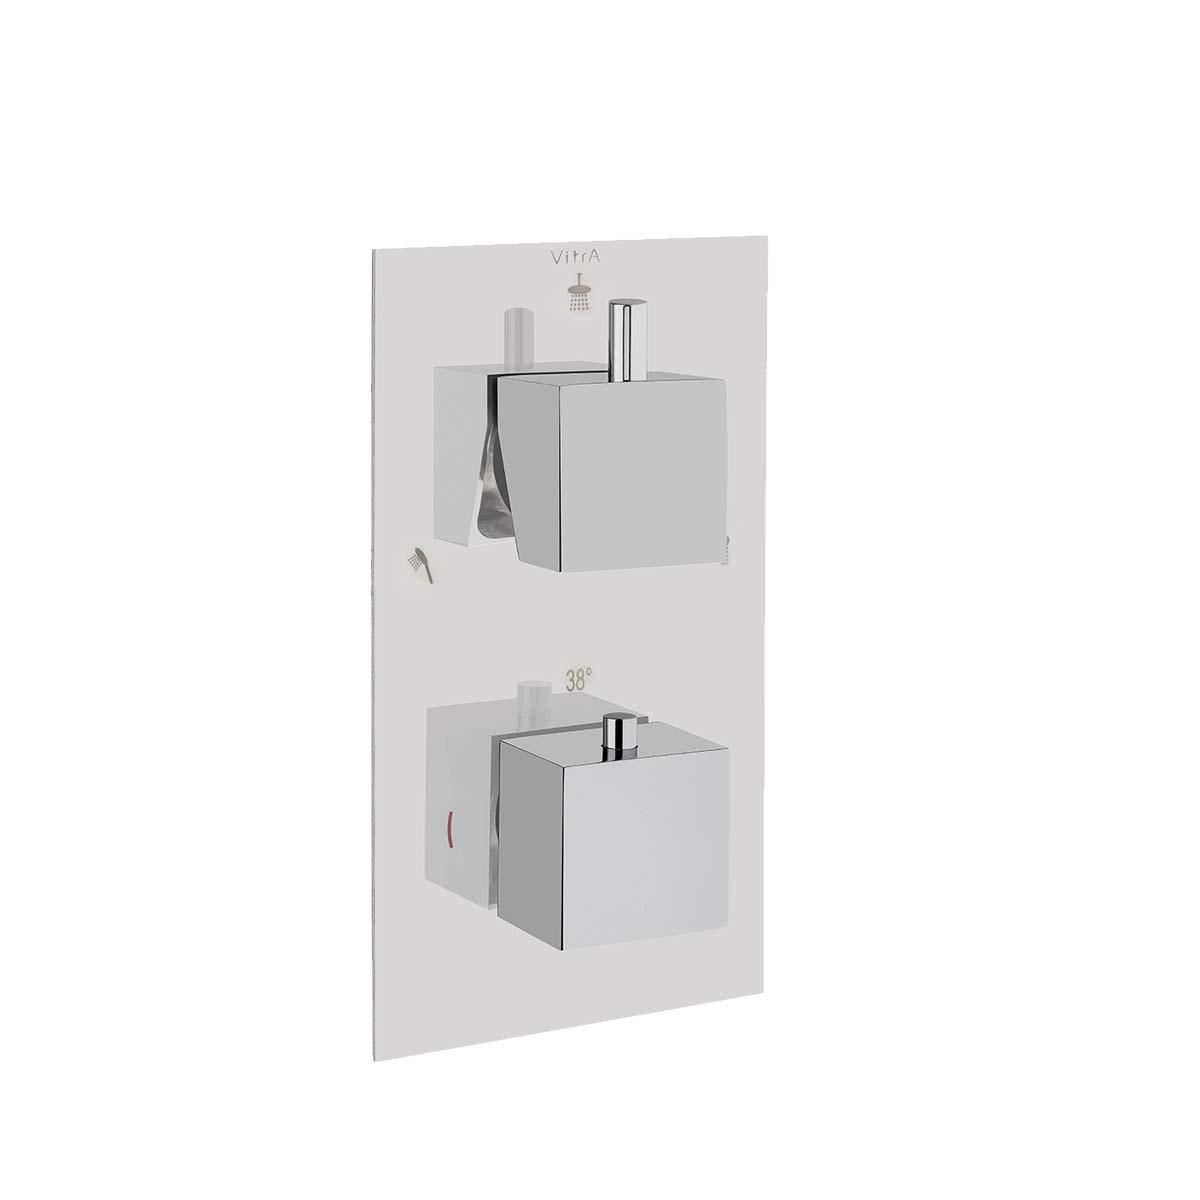 AquaHeat S2 Built-in Bath/Shower mixer (3-way diverter)